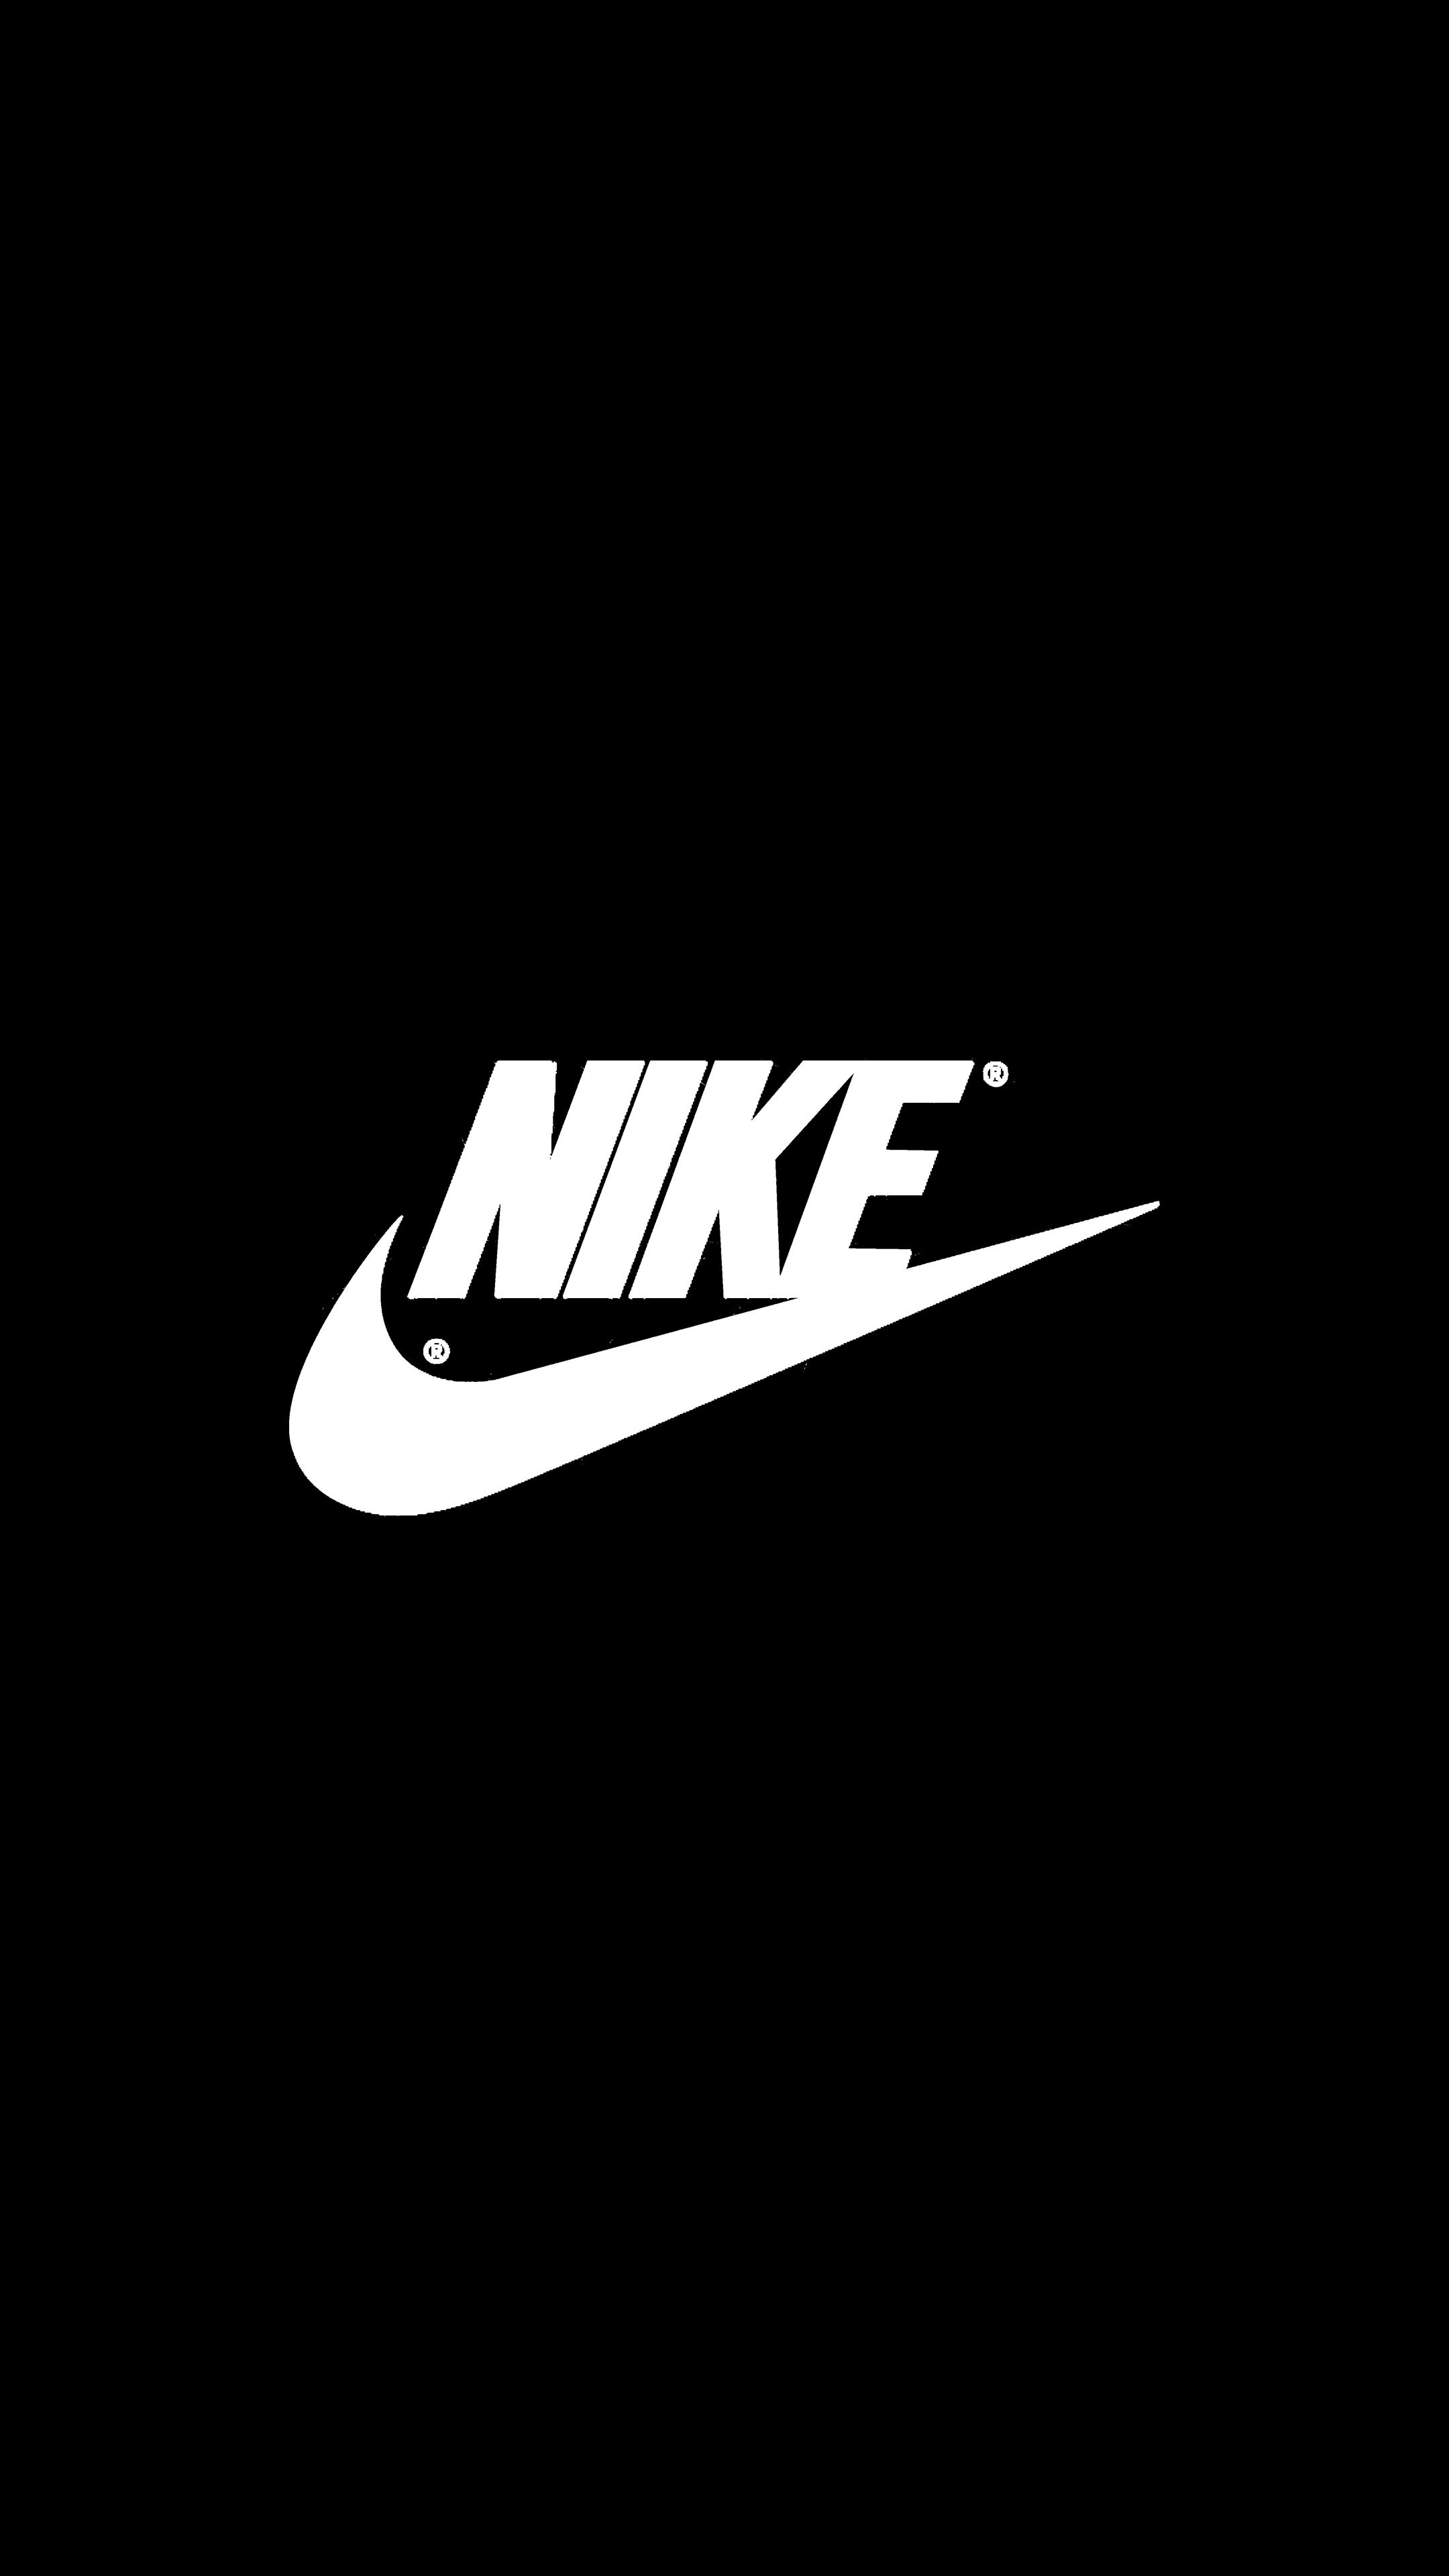 Nike Wallpaper 4k Wallpaper Nice In 2020 Nike Wallpaper Nike Logo Wallpapers Nike Background